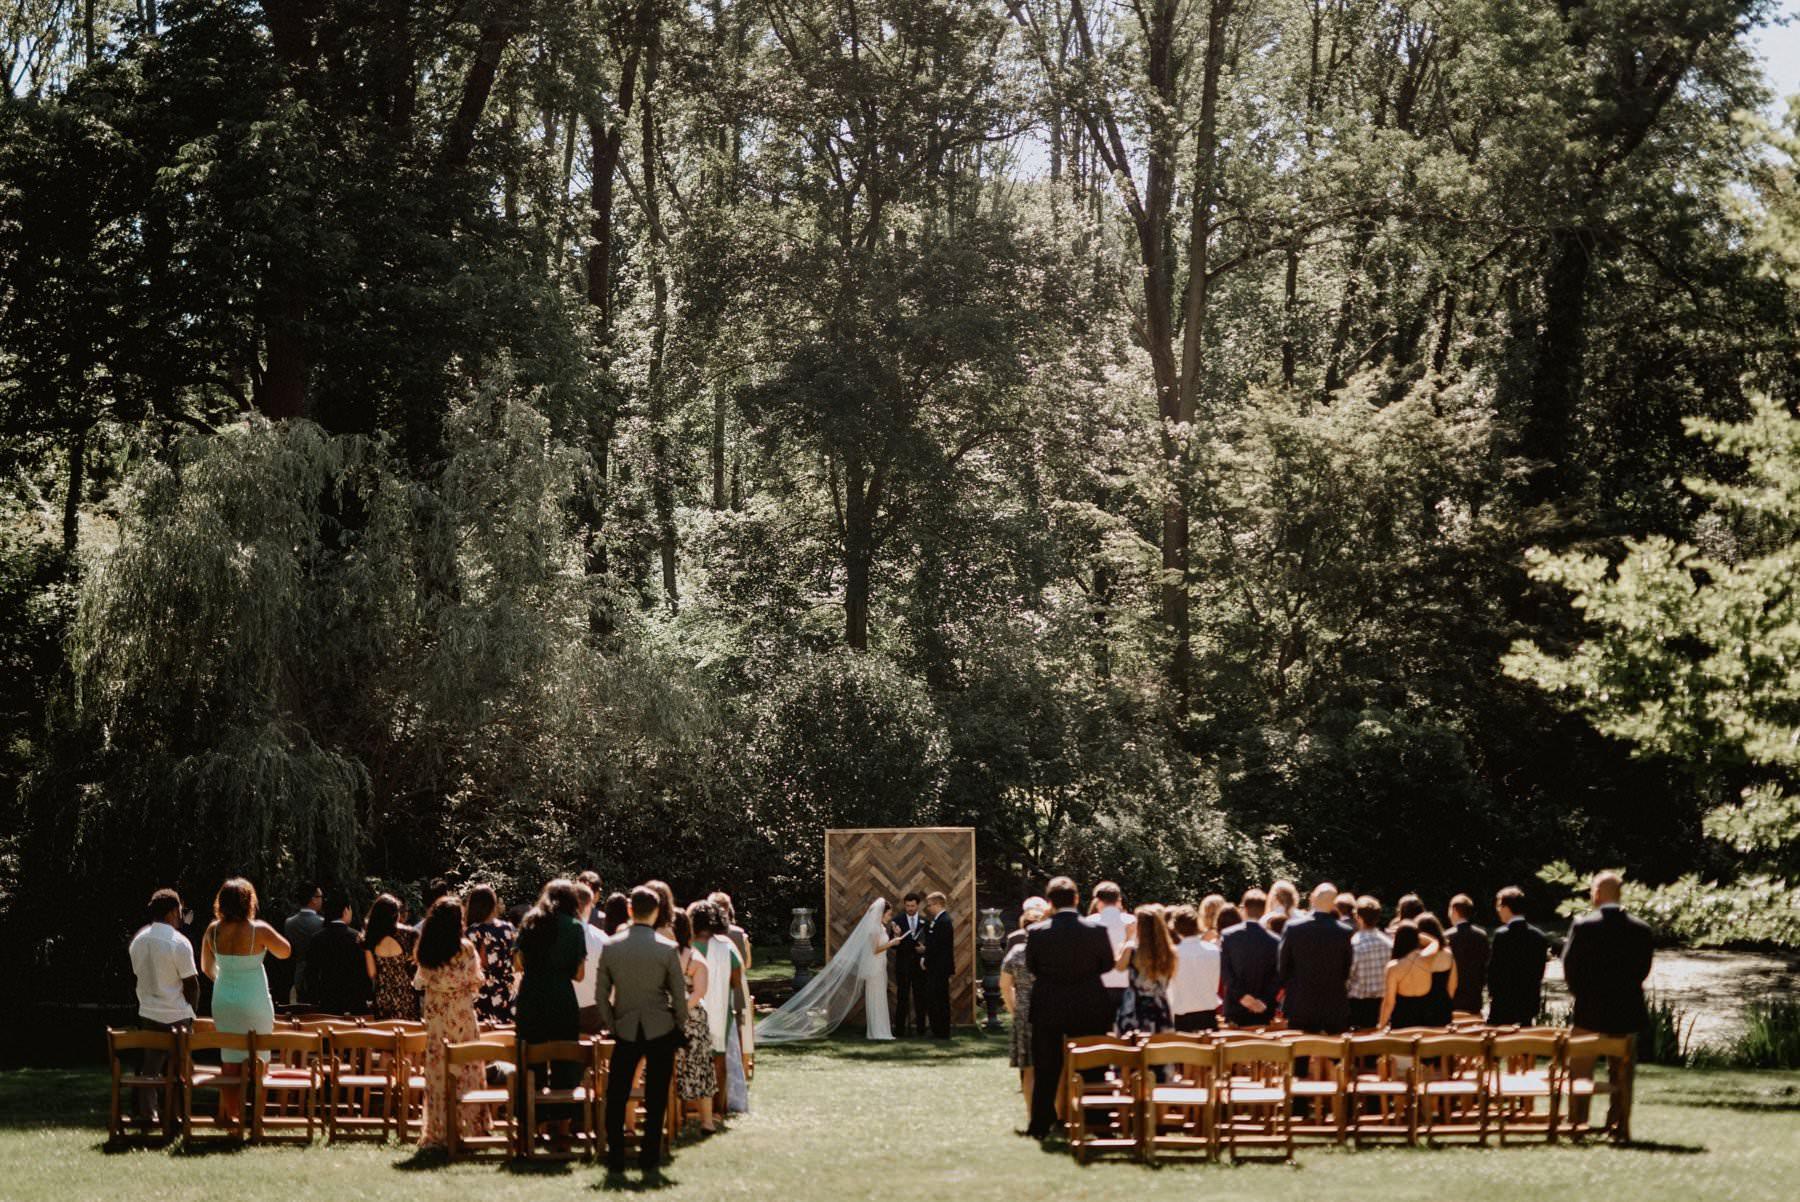 Appleford-estate-wedding-88.jpg